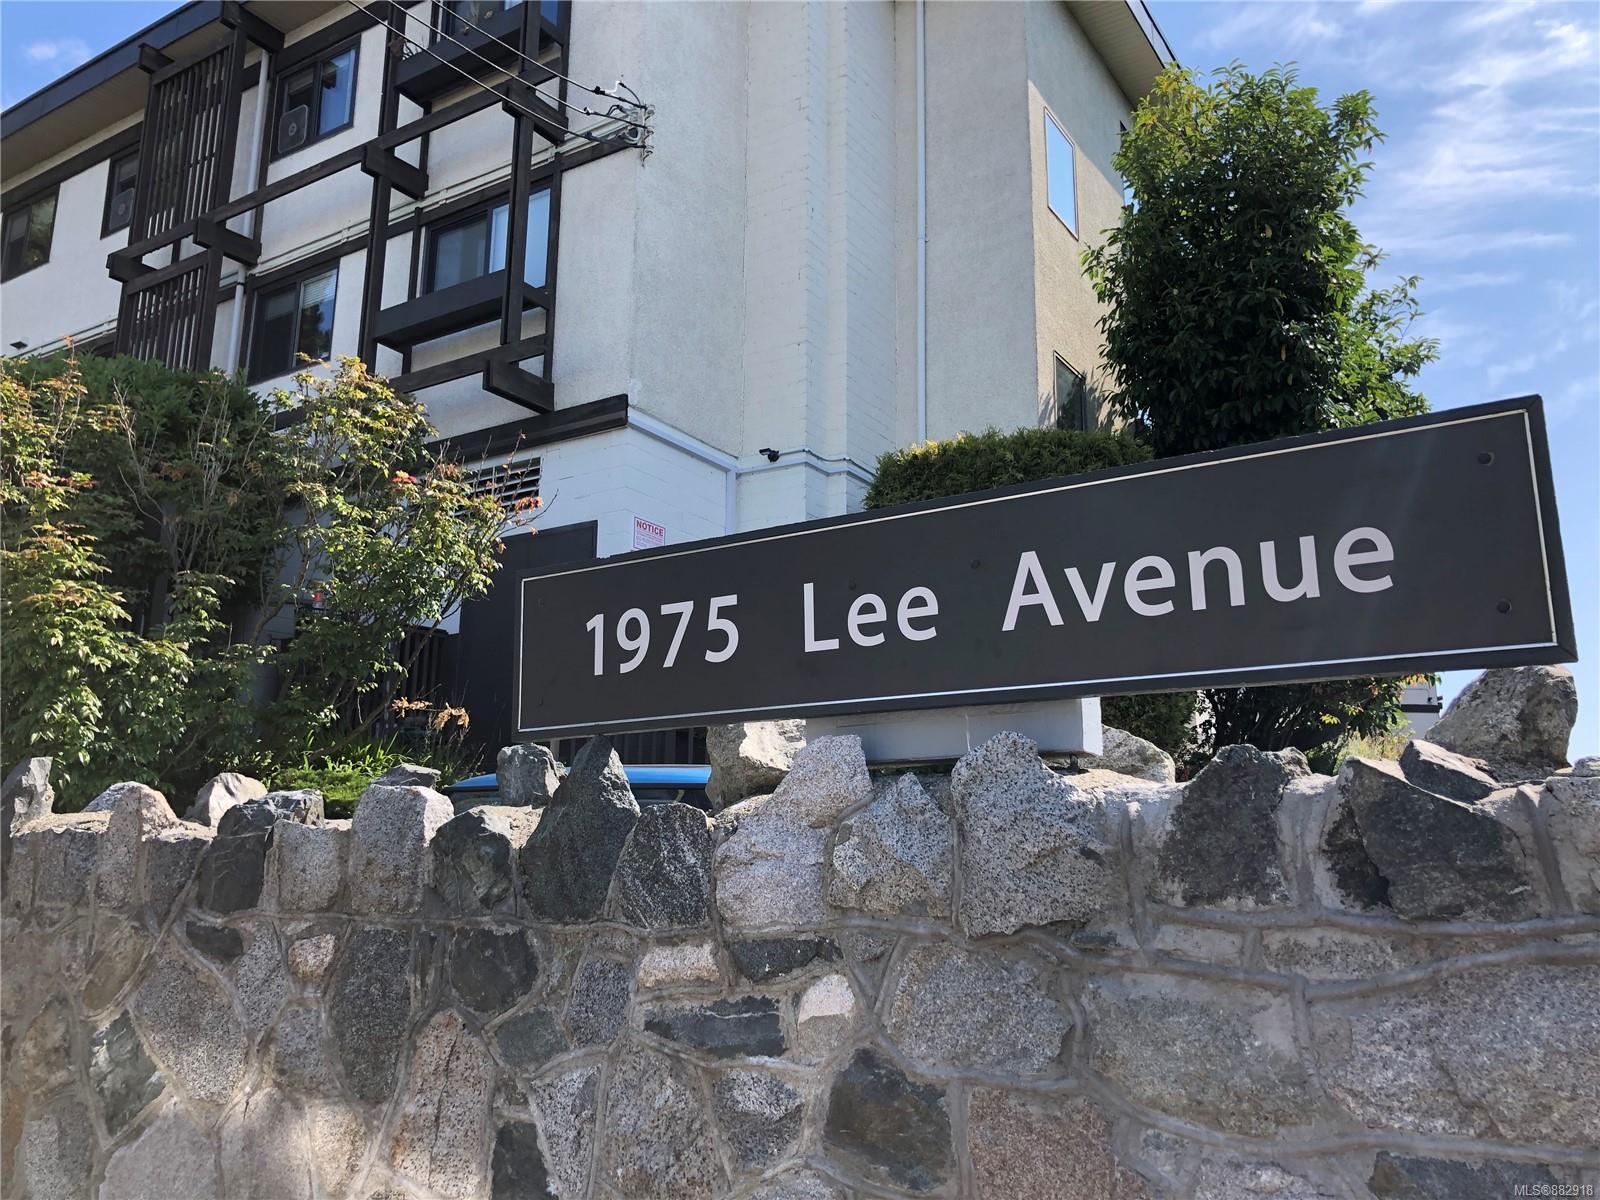 302 - 1975 Lee Avenue, Jubilee, Victoria photo number 2